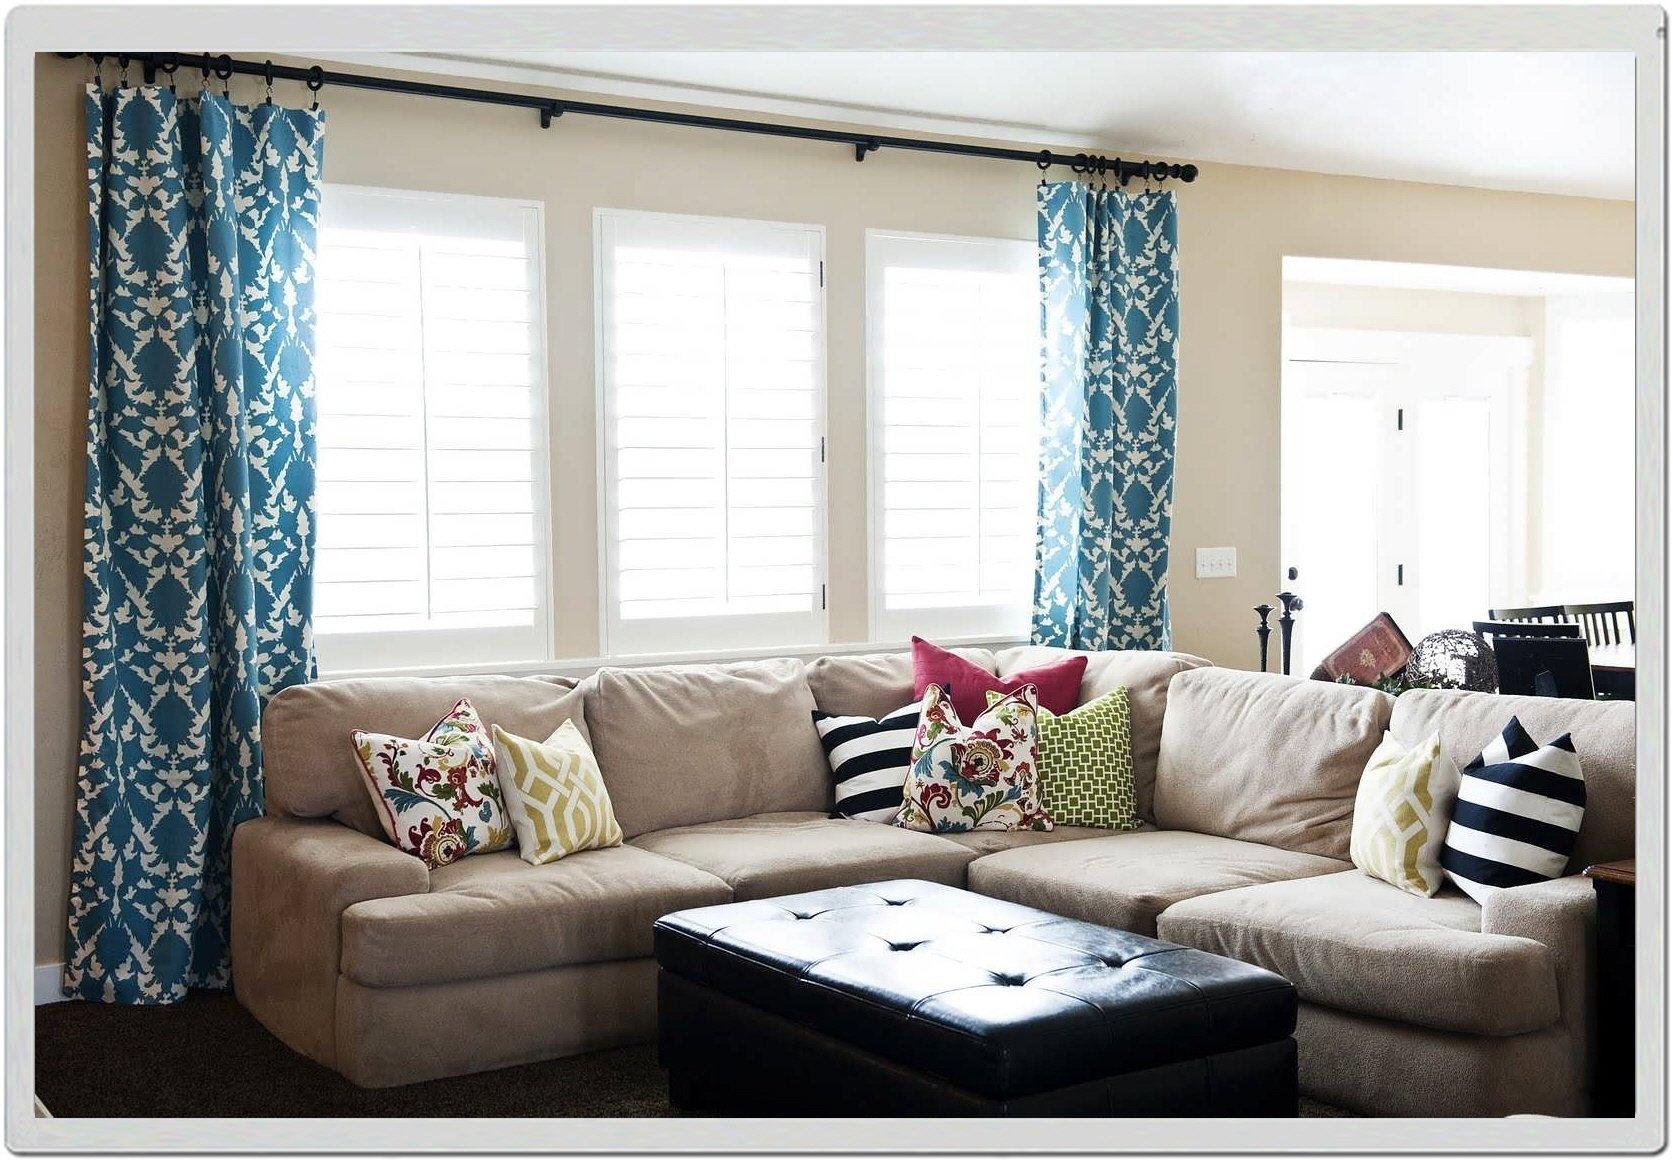 10 Cute Living Room Window Treatment Ideas livingroom curtain ideas for small living room window treatment 2020